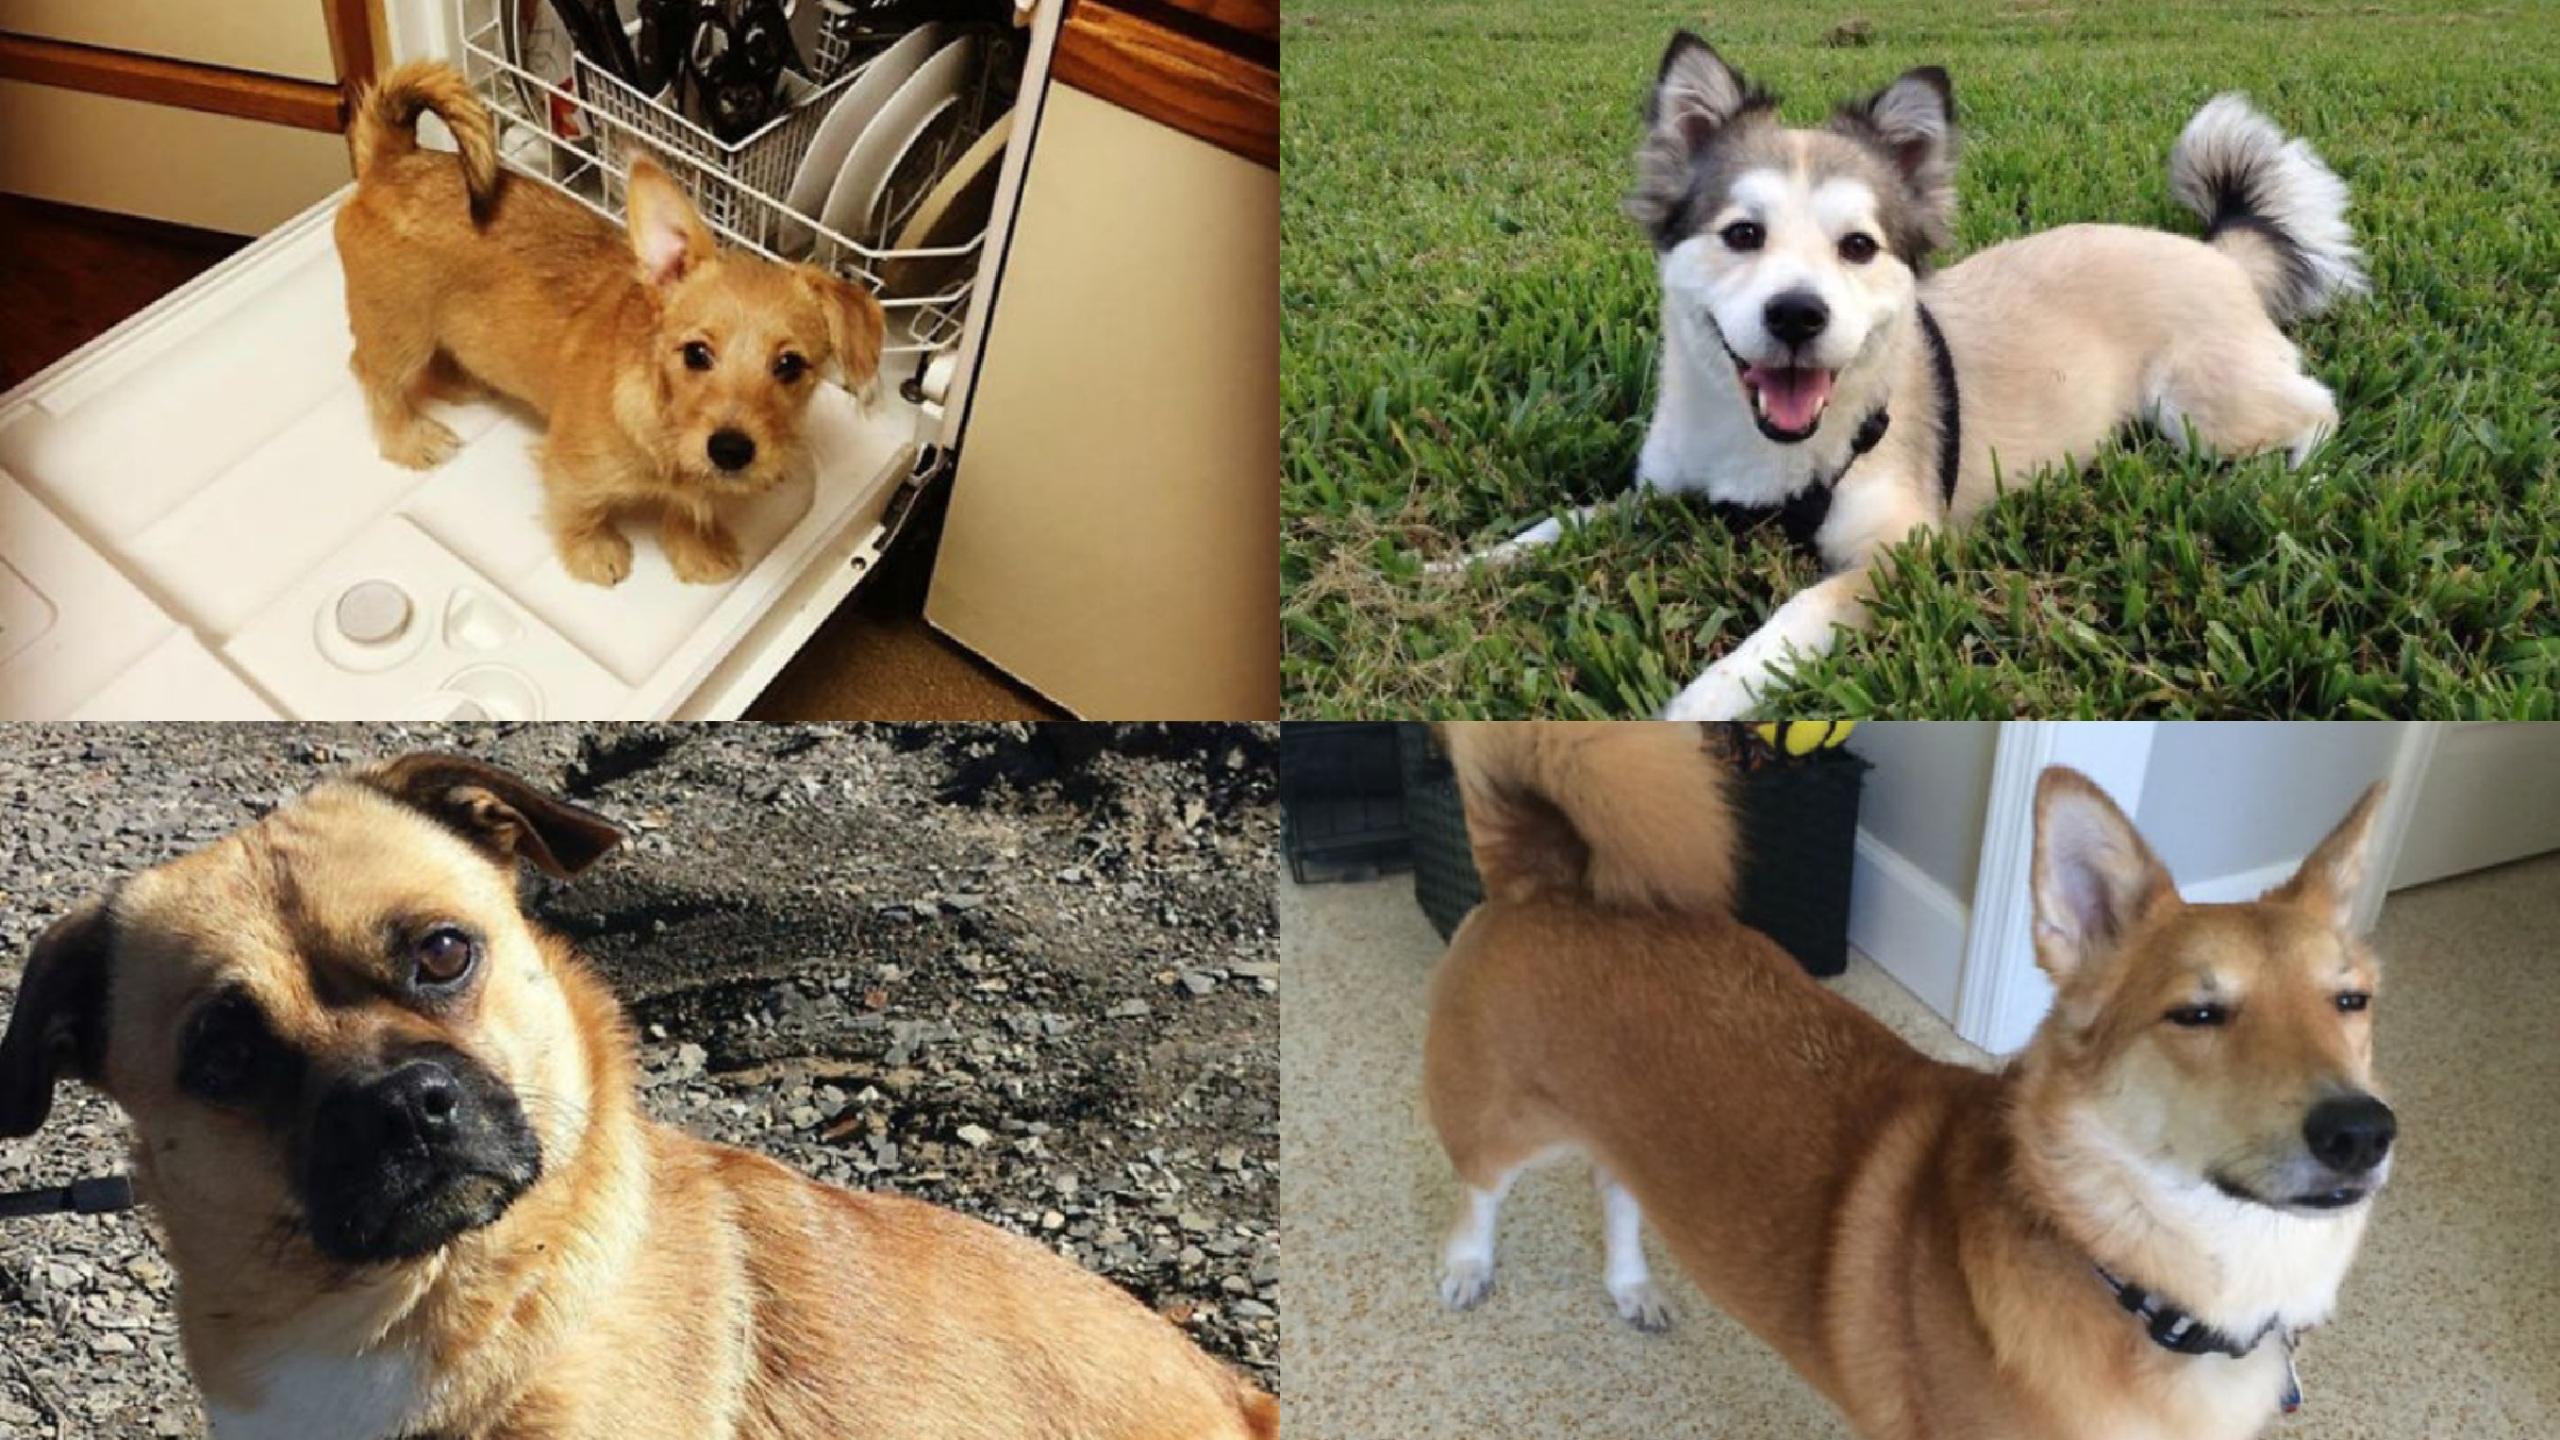 Corgi, Mezcla, Raza, Perros, Cachorro, Bebé, Husky, Bulldog